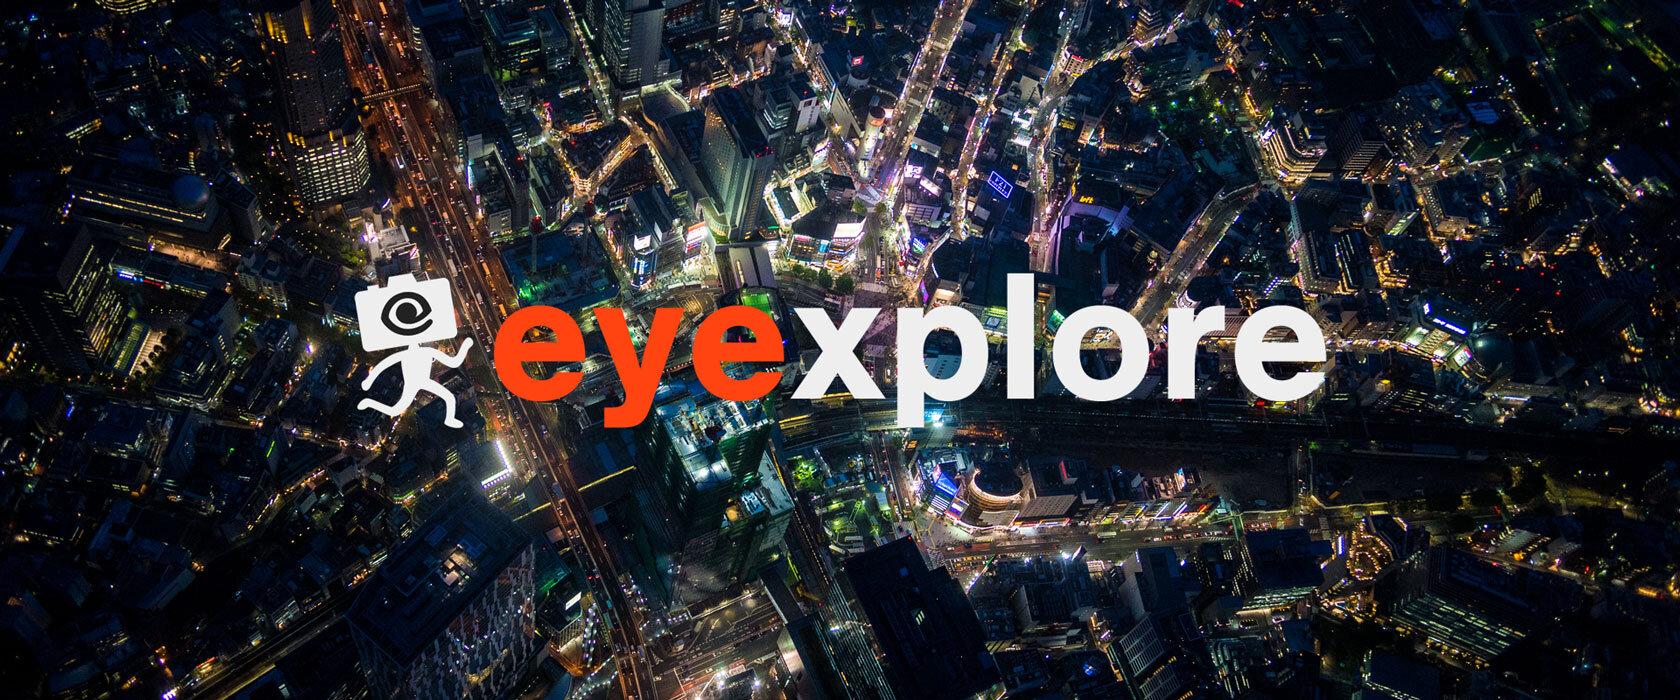 eyexplore.jpg